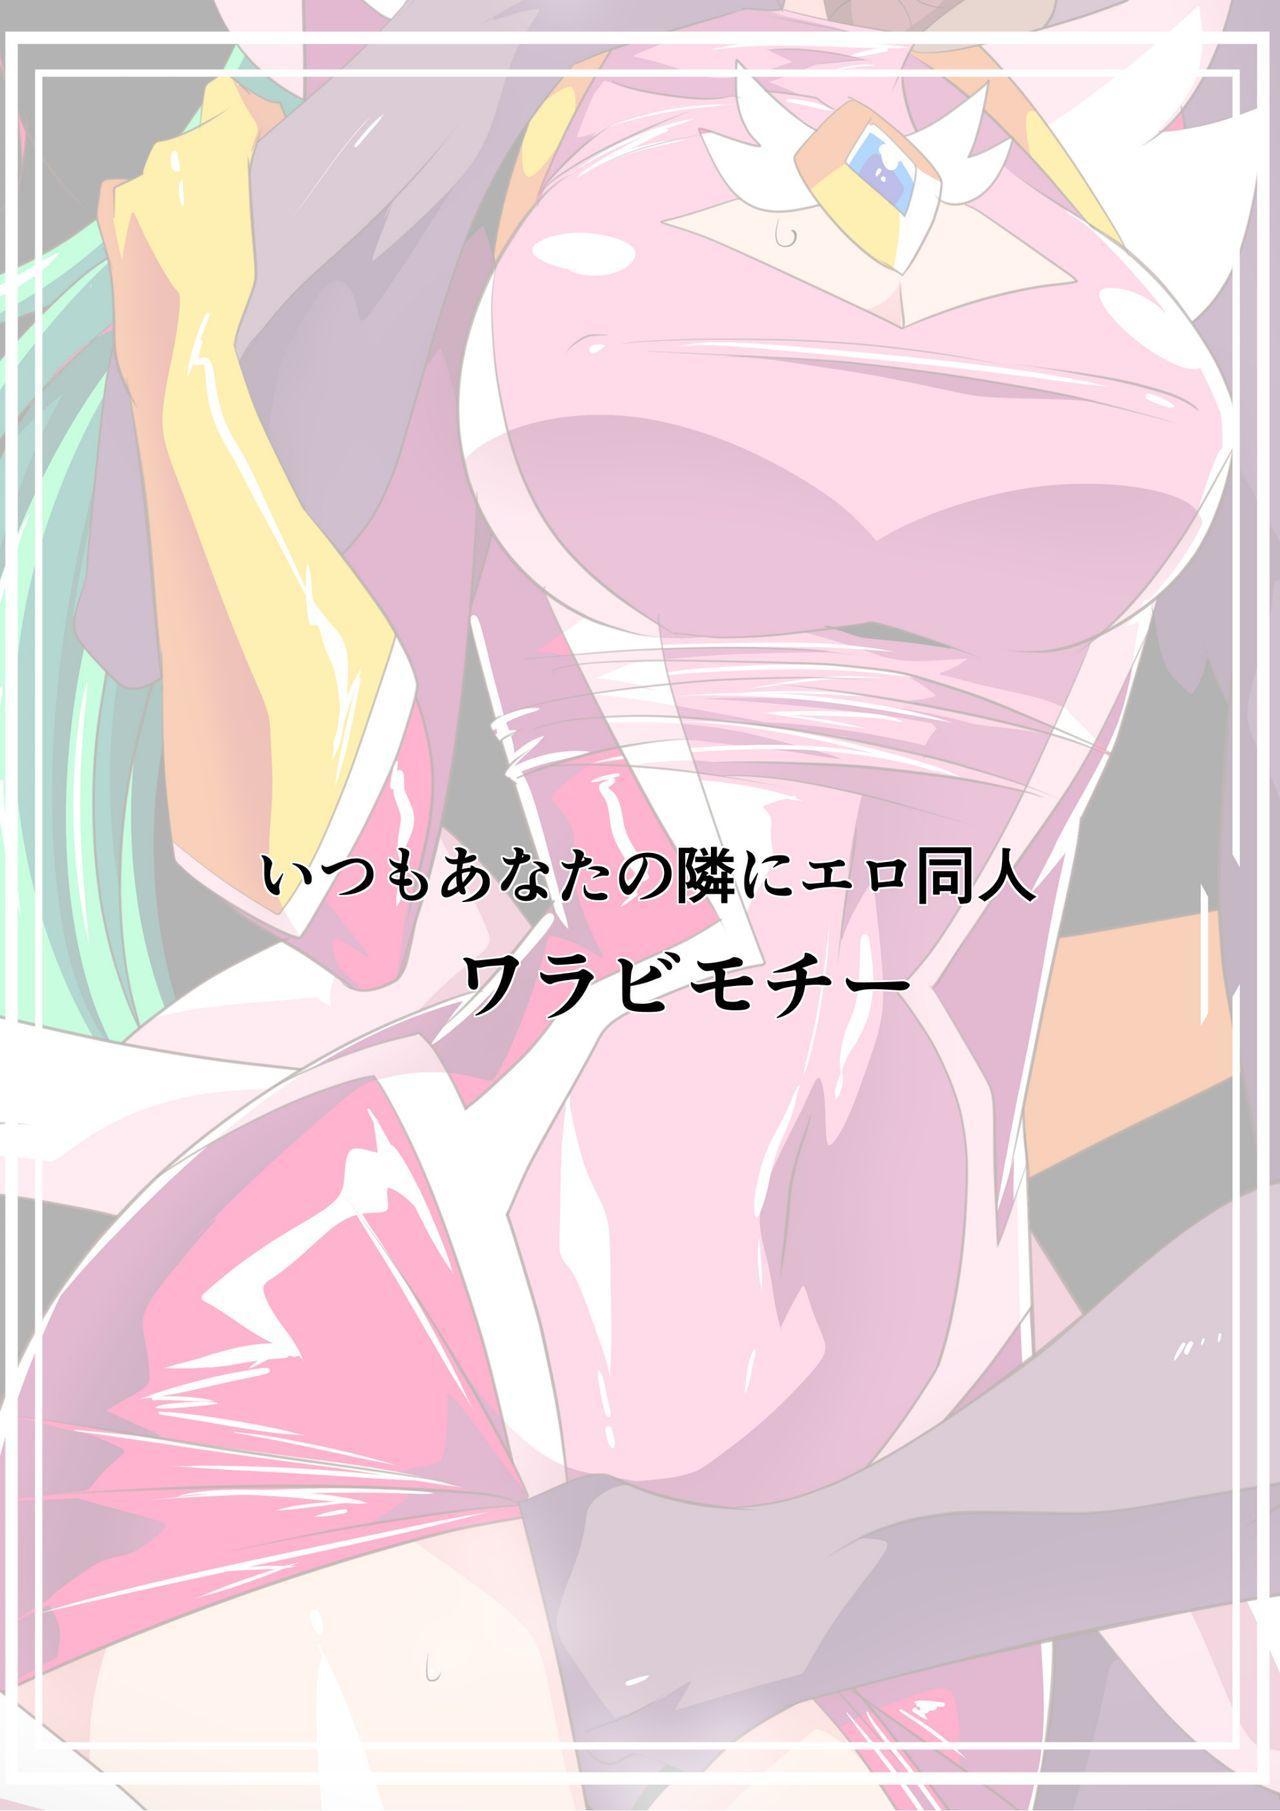 HEROINE LOSE 2 Psycho Lady Meteor Hen Psycho Power Heroine VS Kyousei Chikan Choukyou! 26